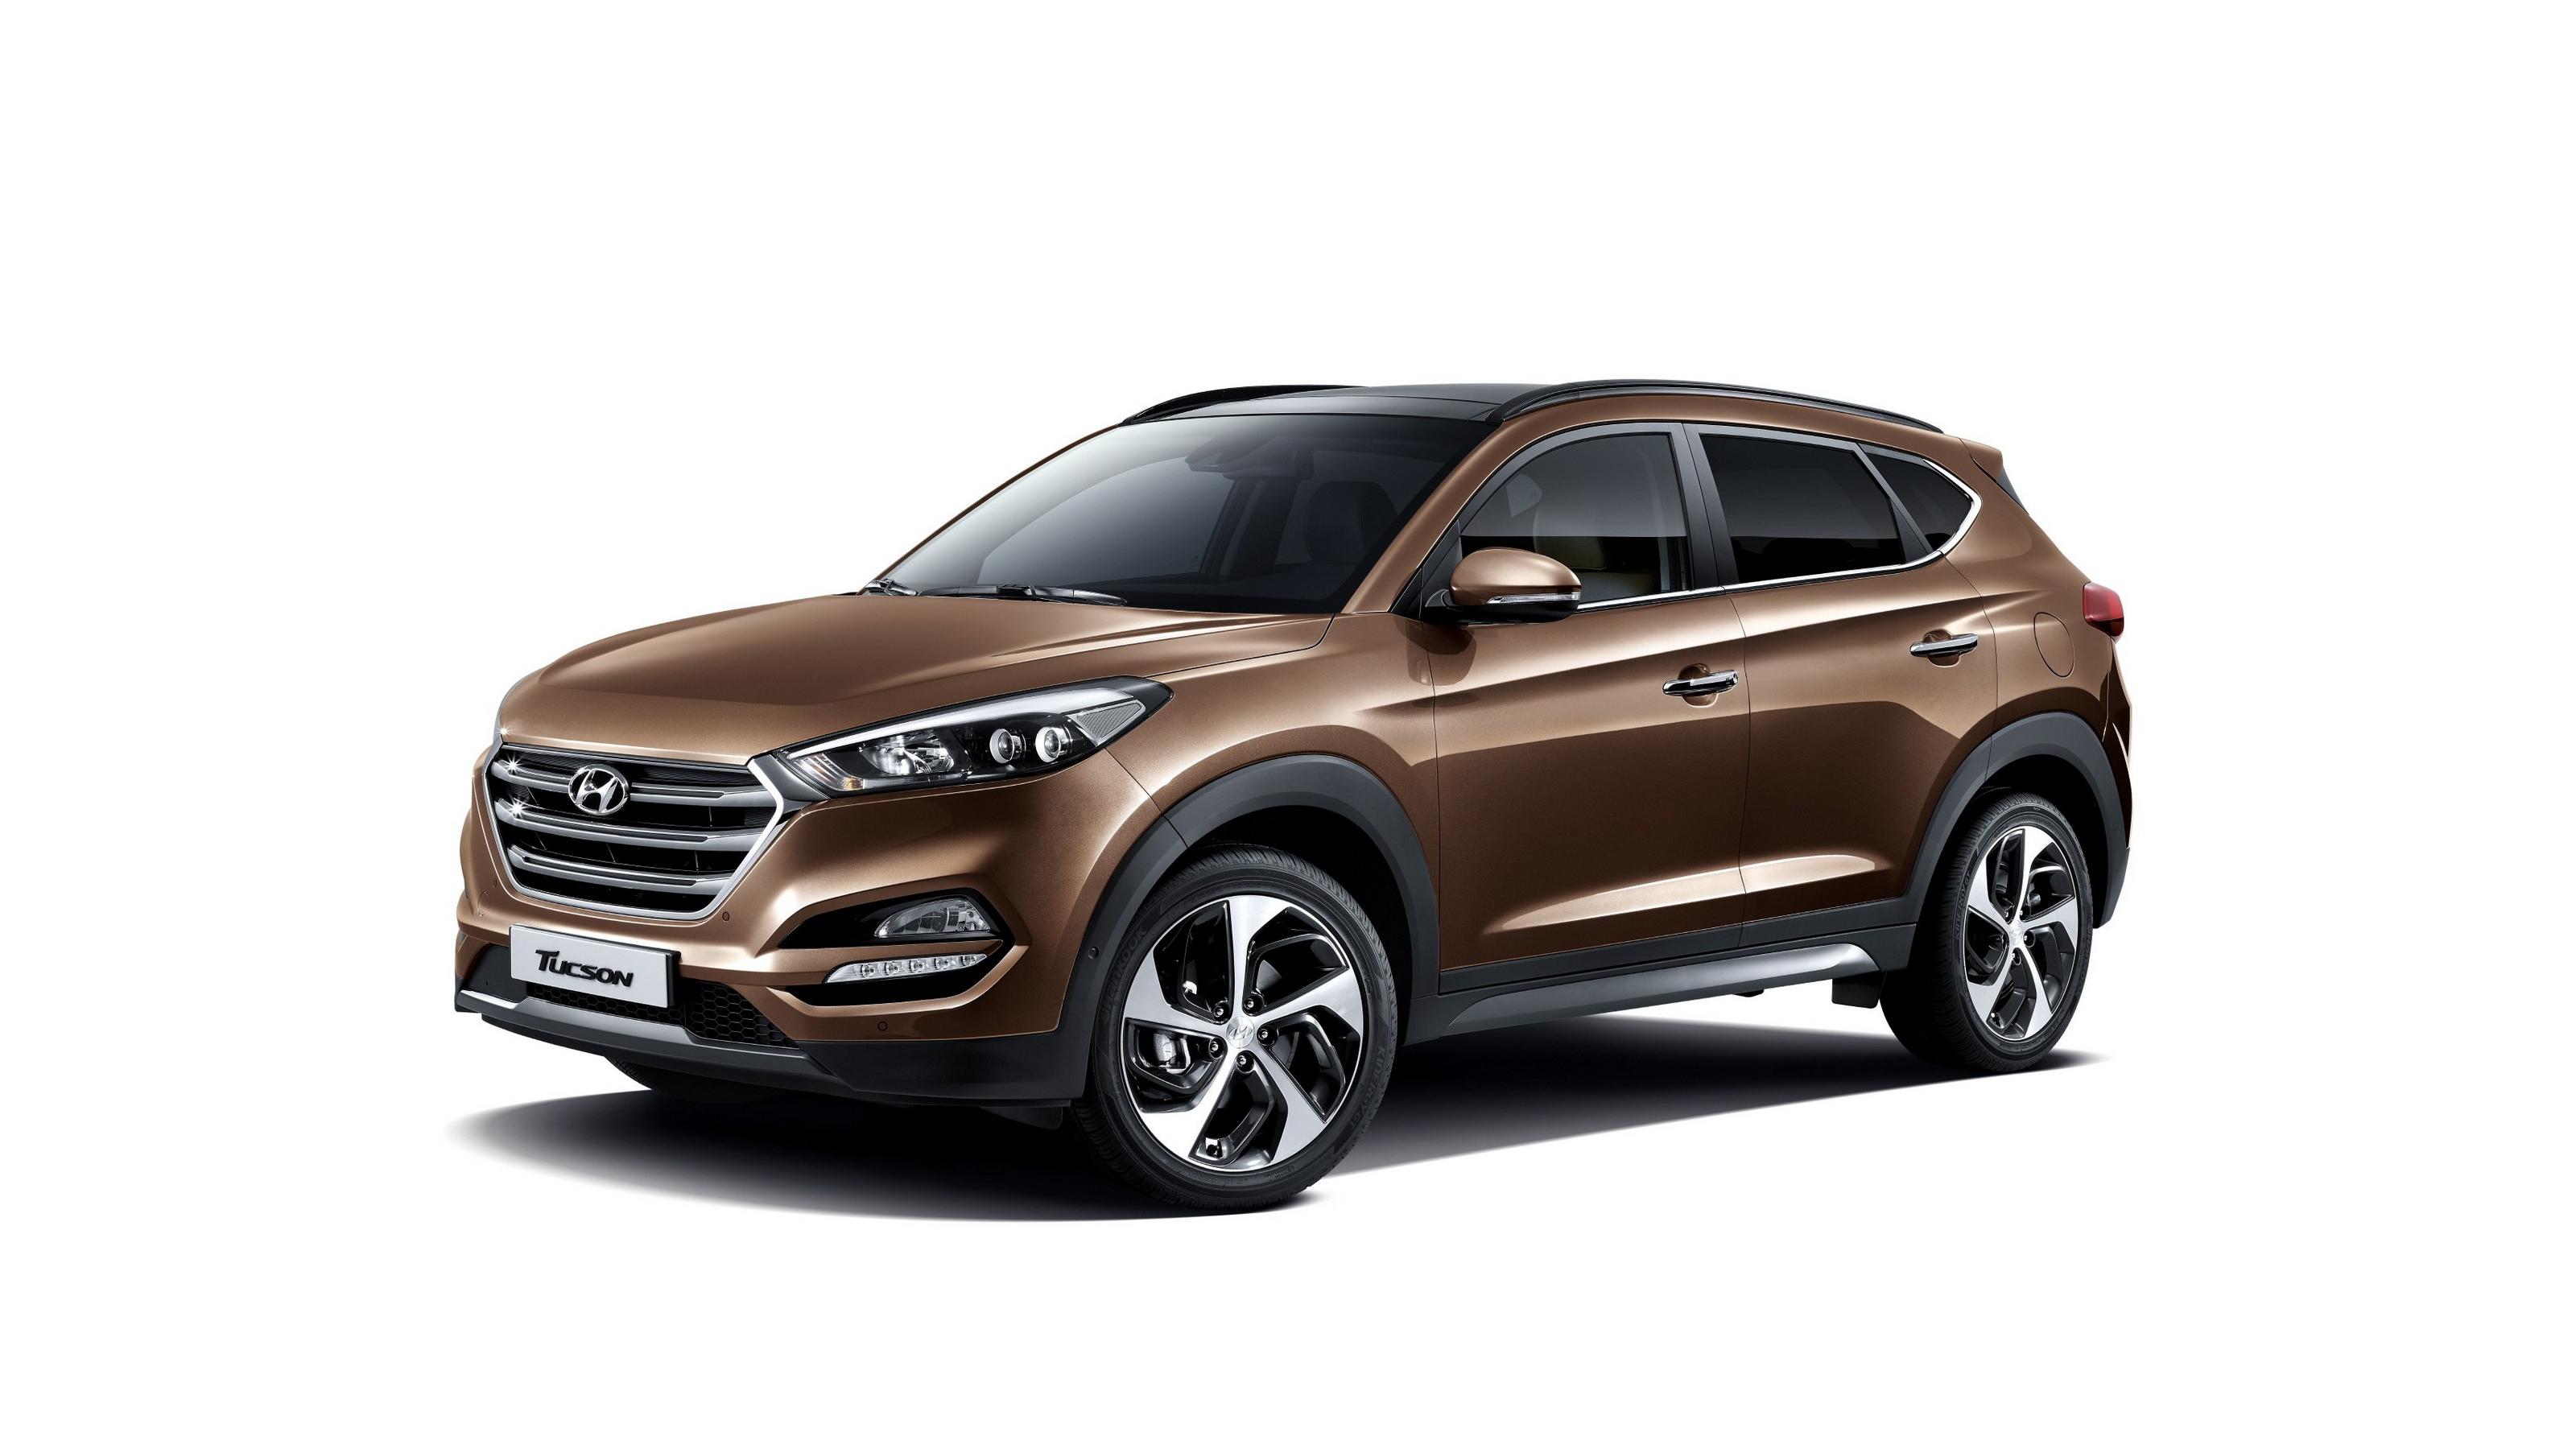 5 Hyundai Tucson HD Wallpapers